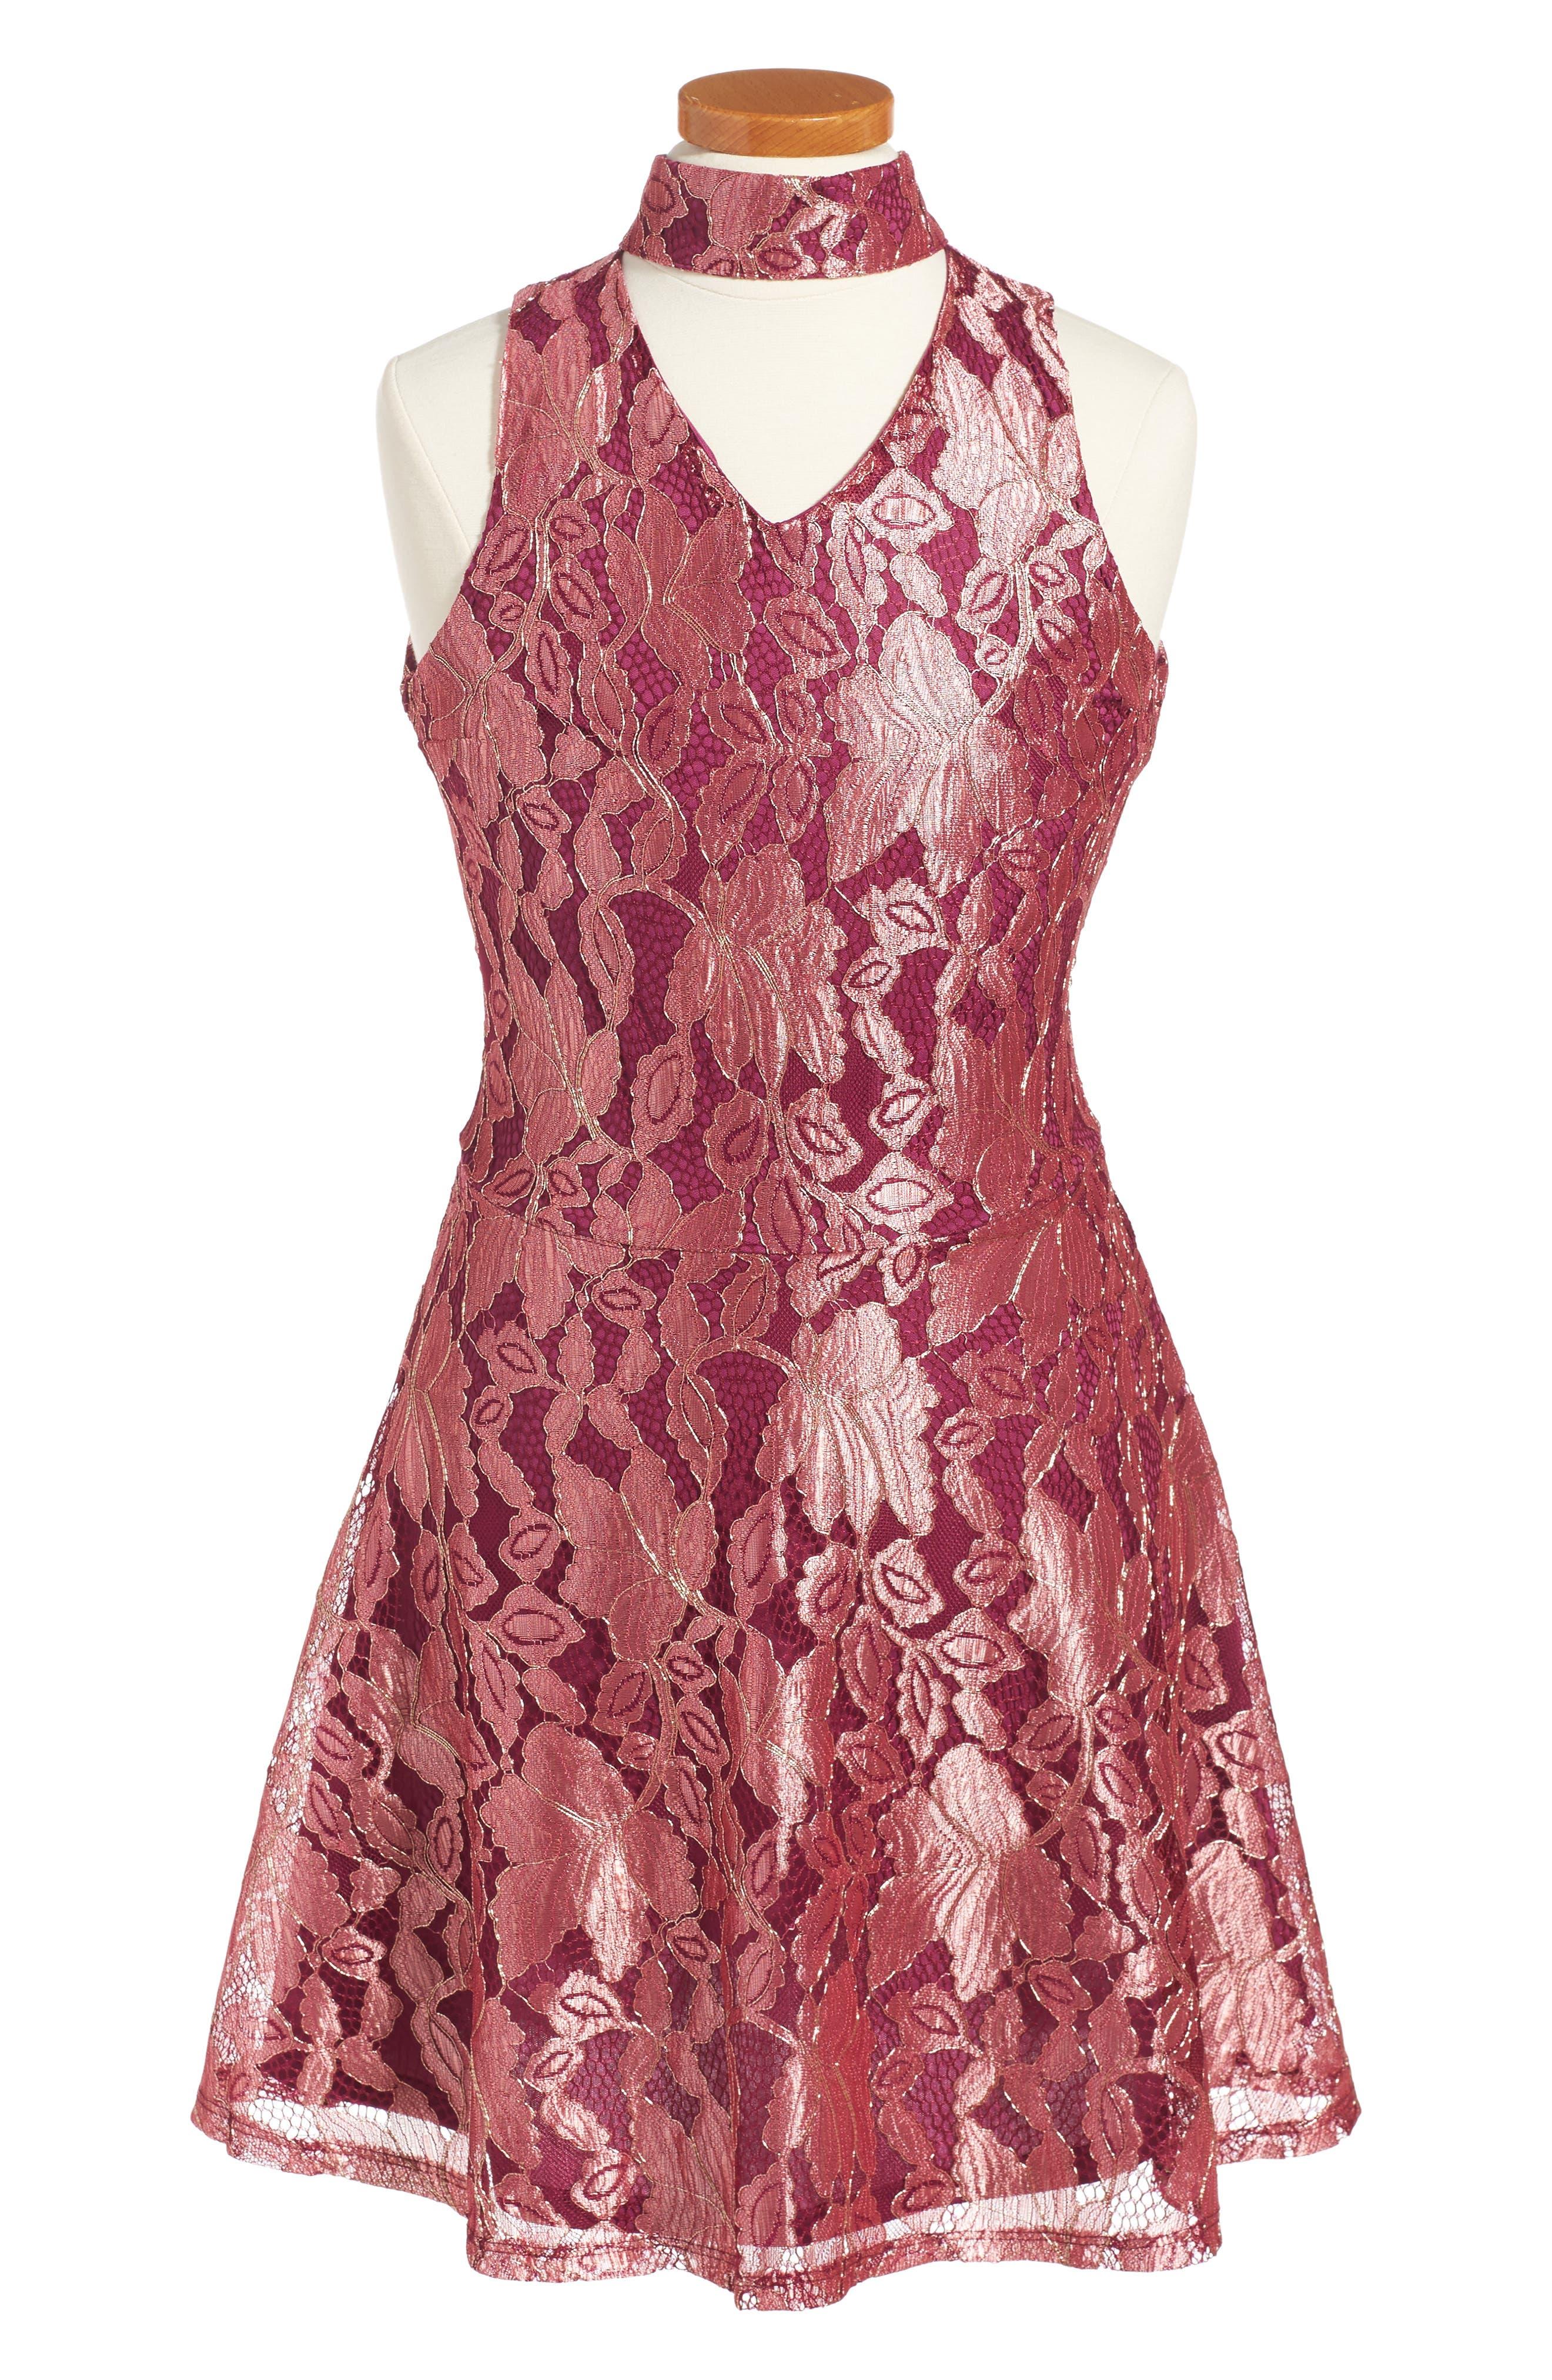 Alternate Image 1 Selected - Penelope Tree Ariana Lace Dress (Big Girls)